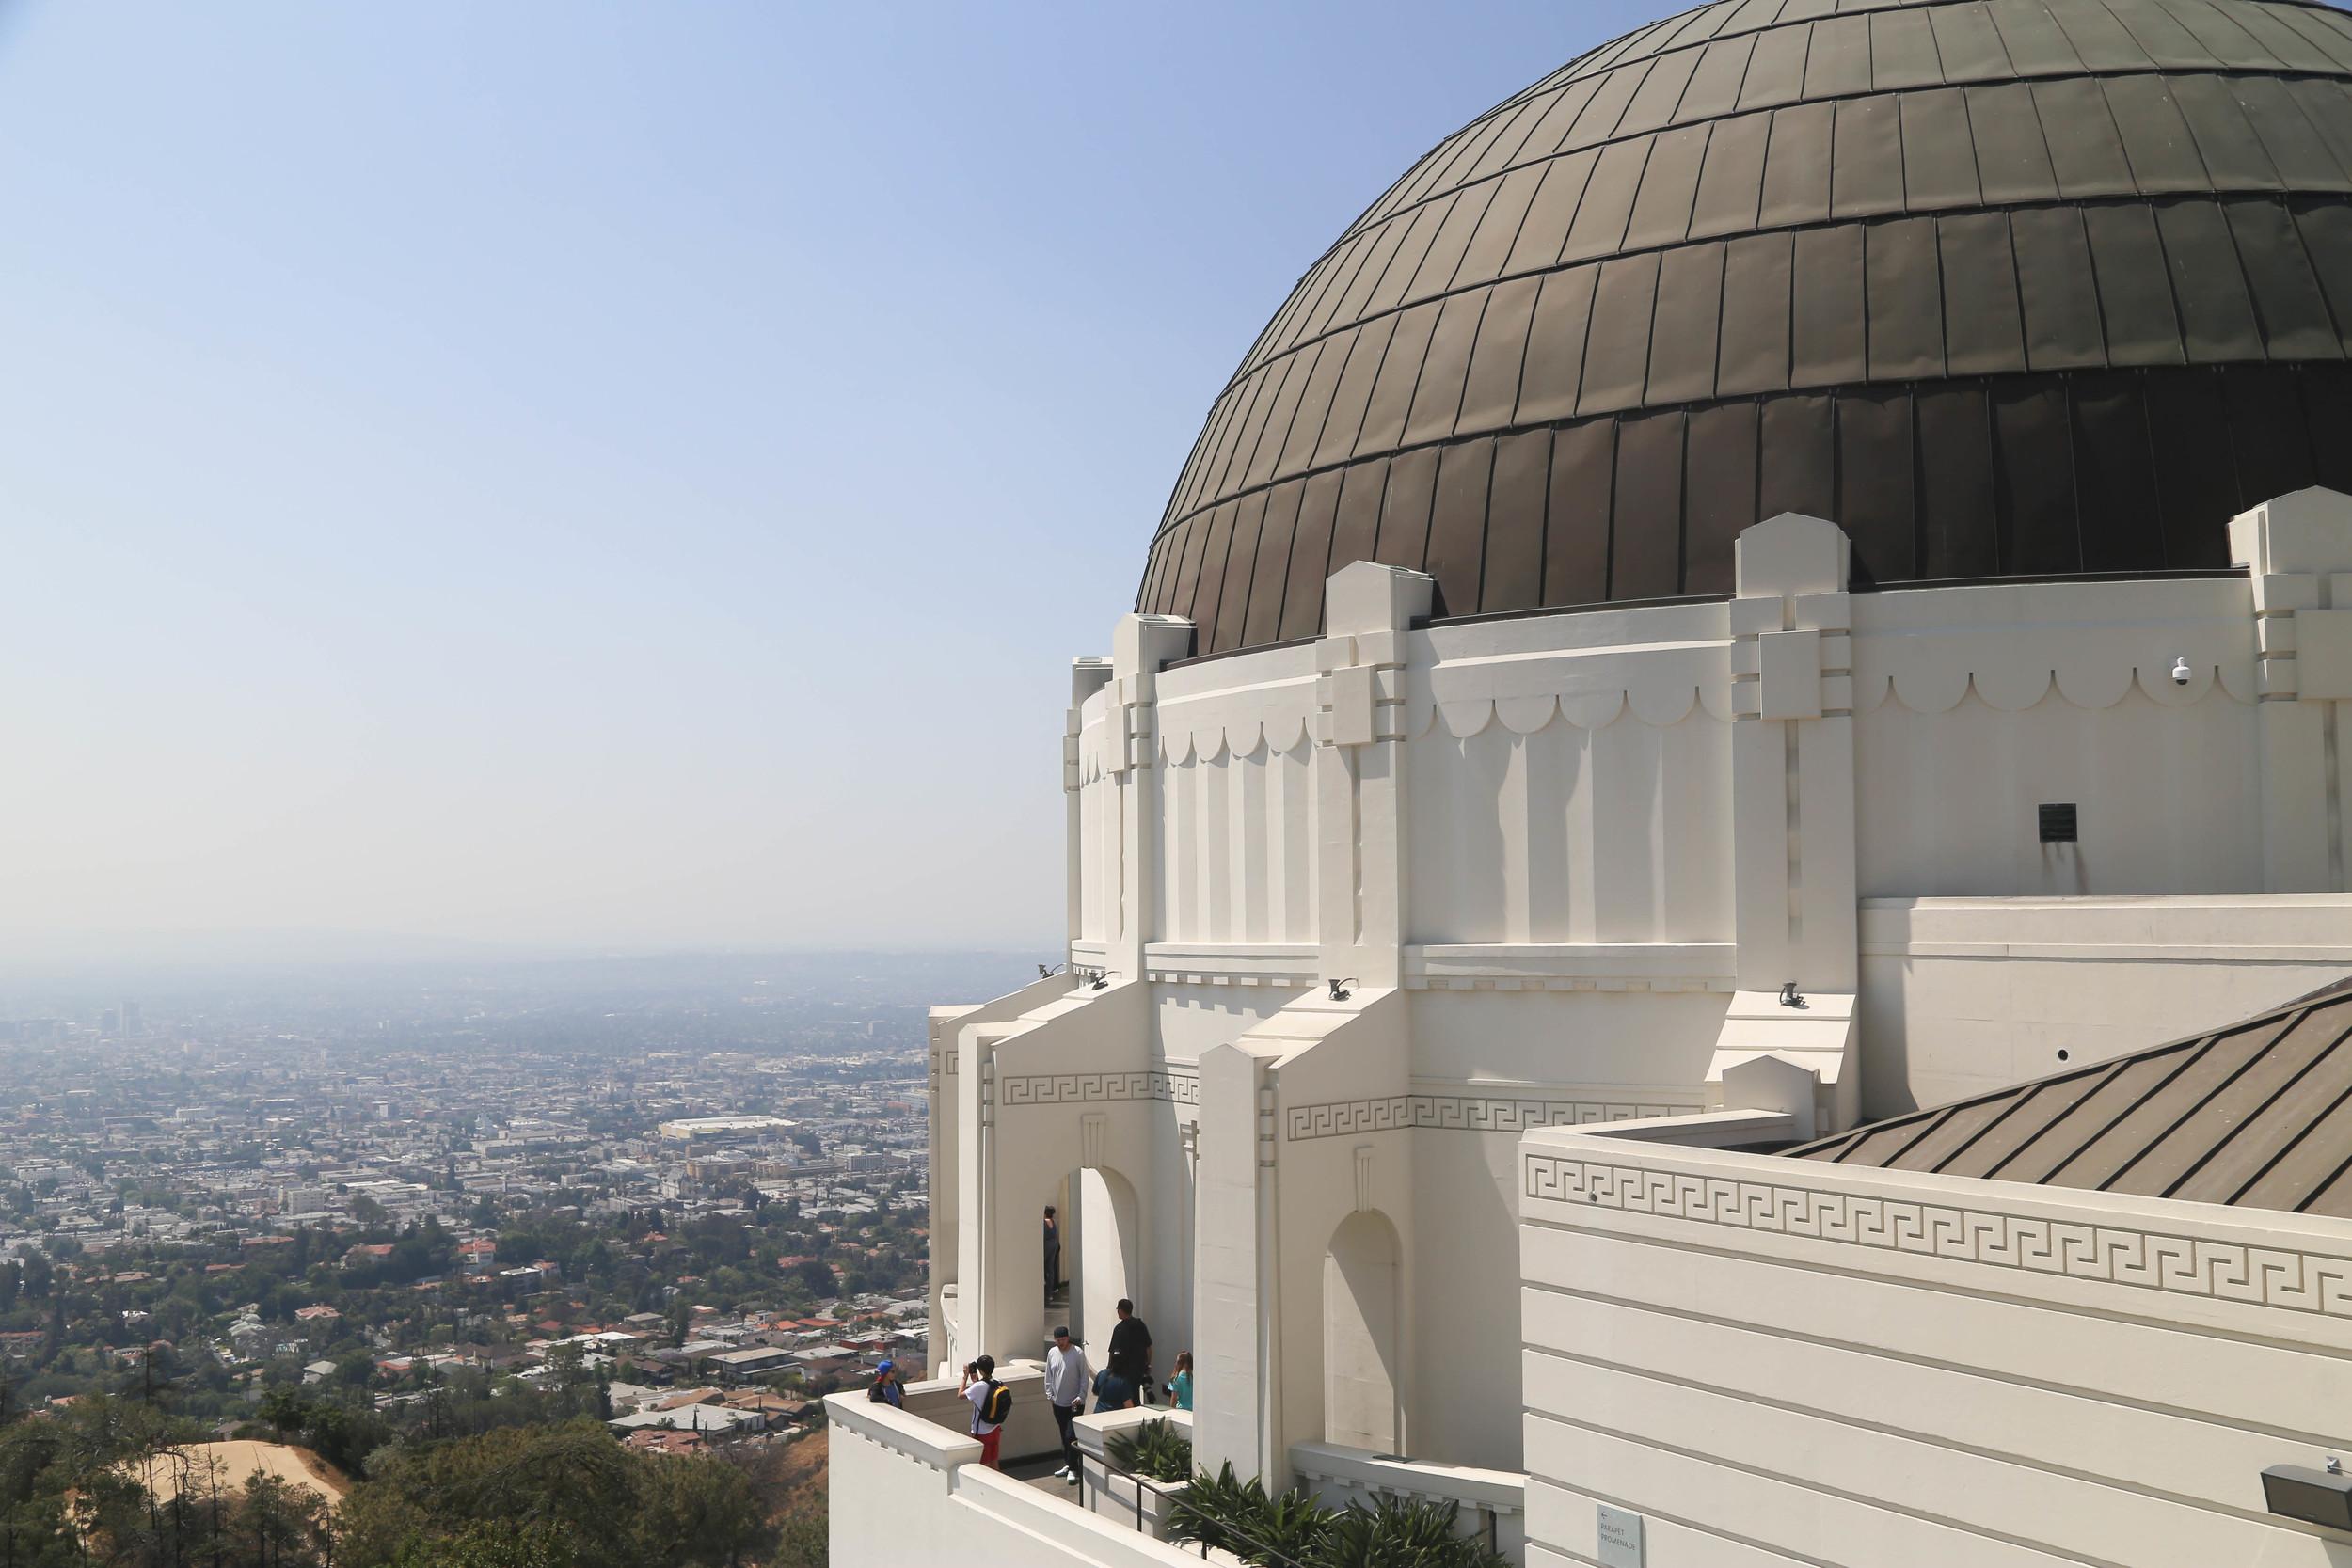 Stylenfuse by Natalie Alvarado Griffith Observatory